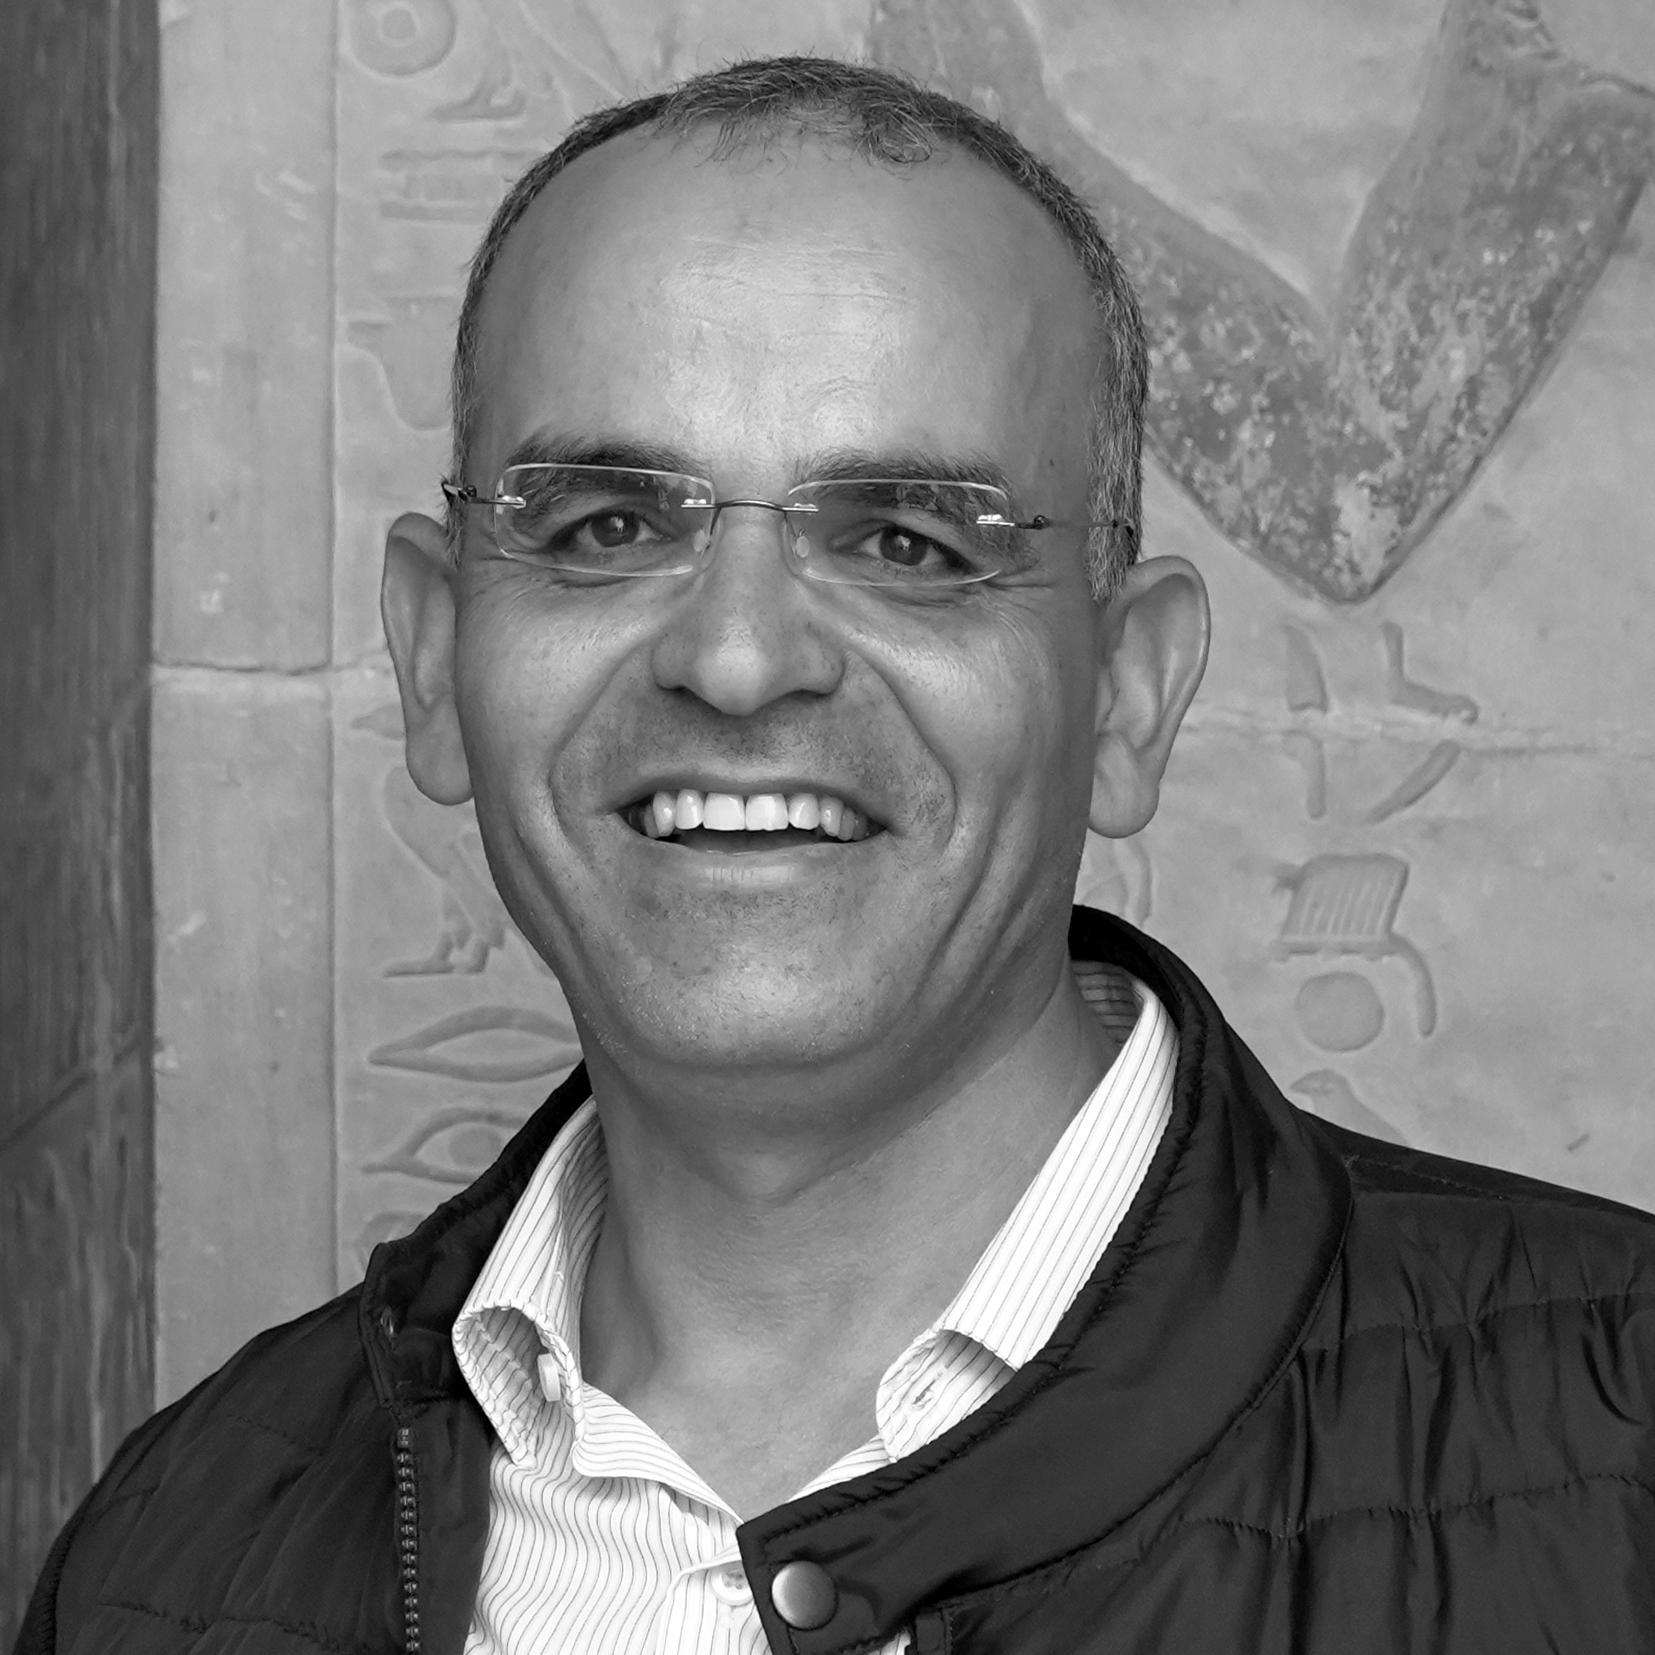 Ibrahim Morgan